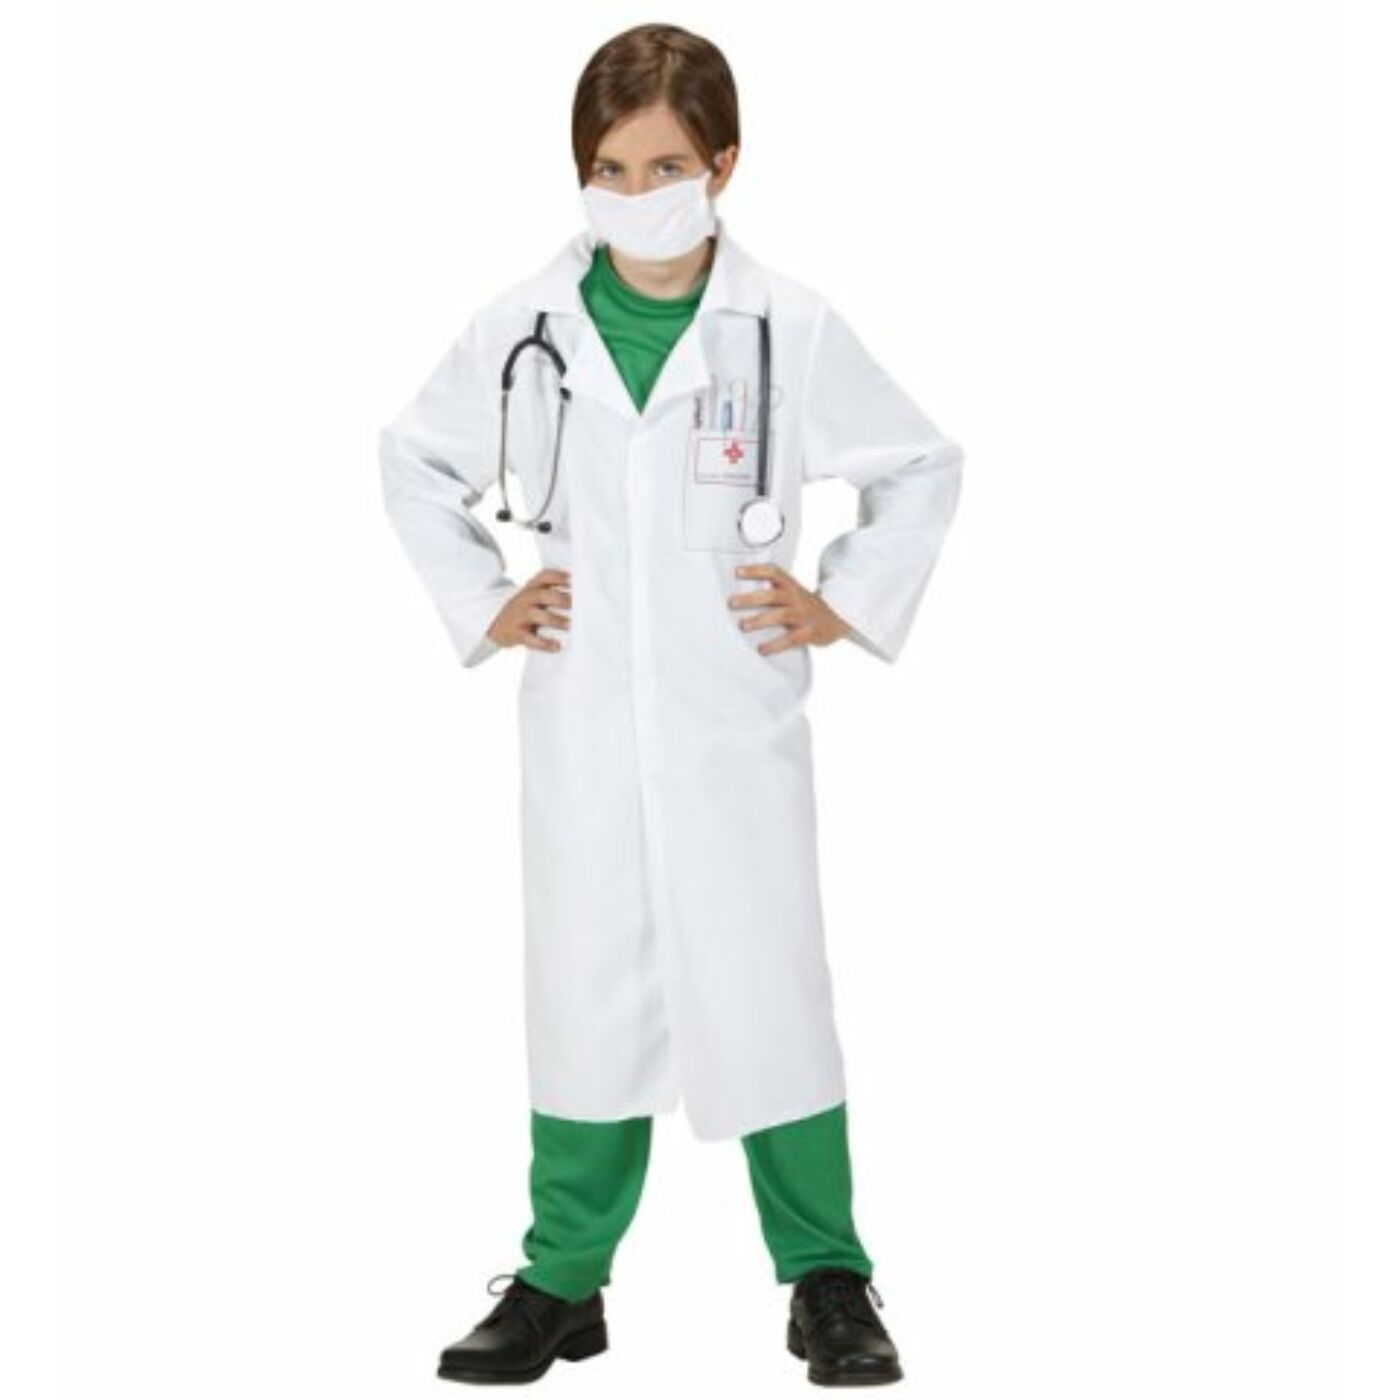 Doktor jelmez 158-as